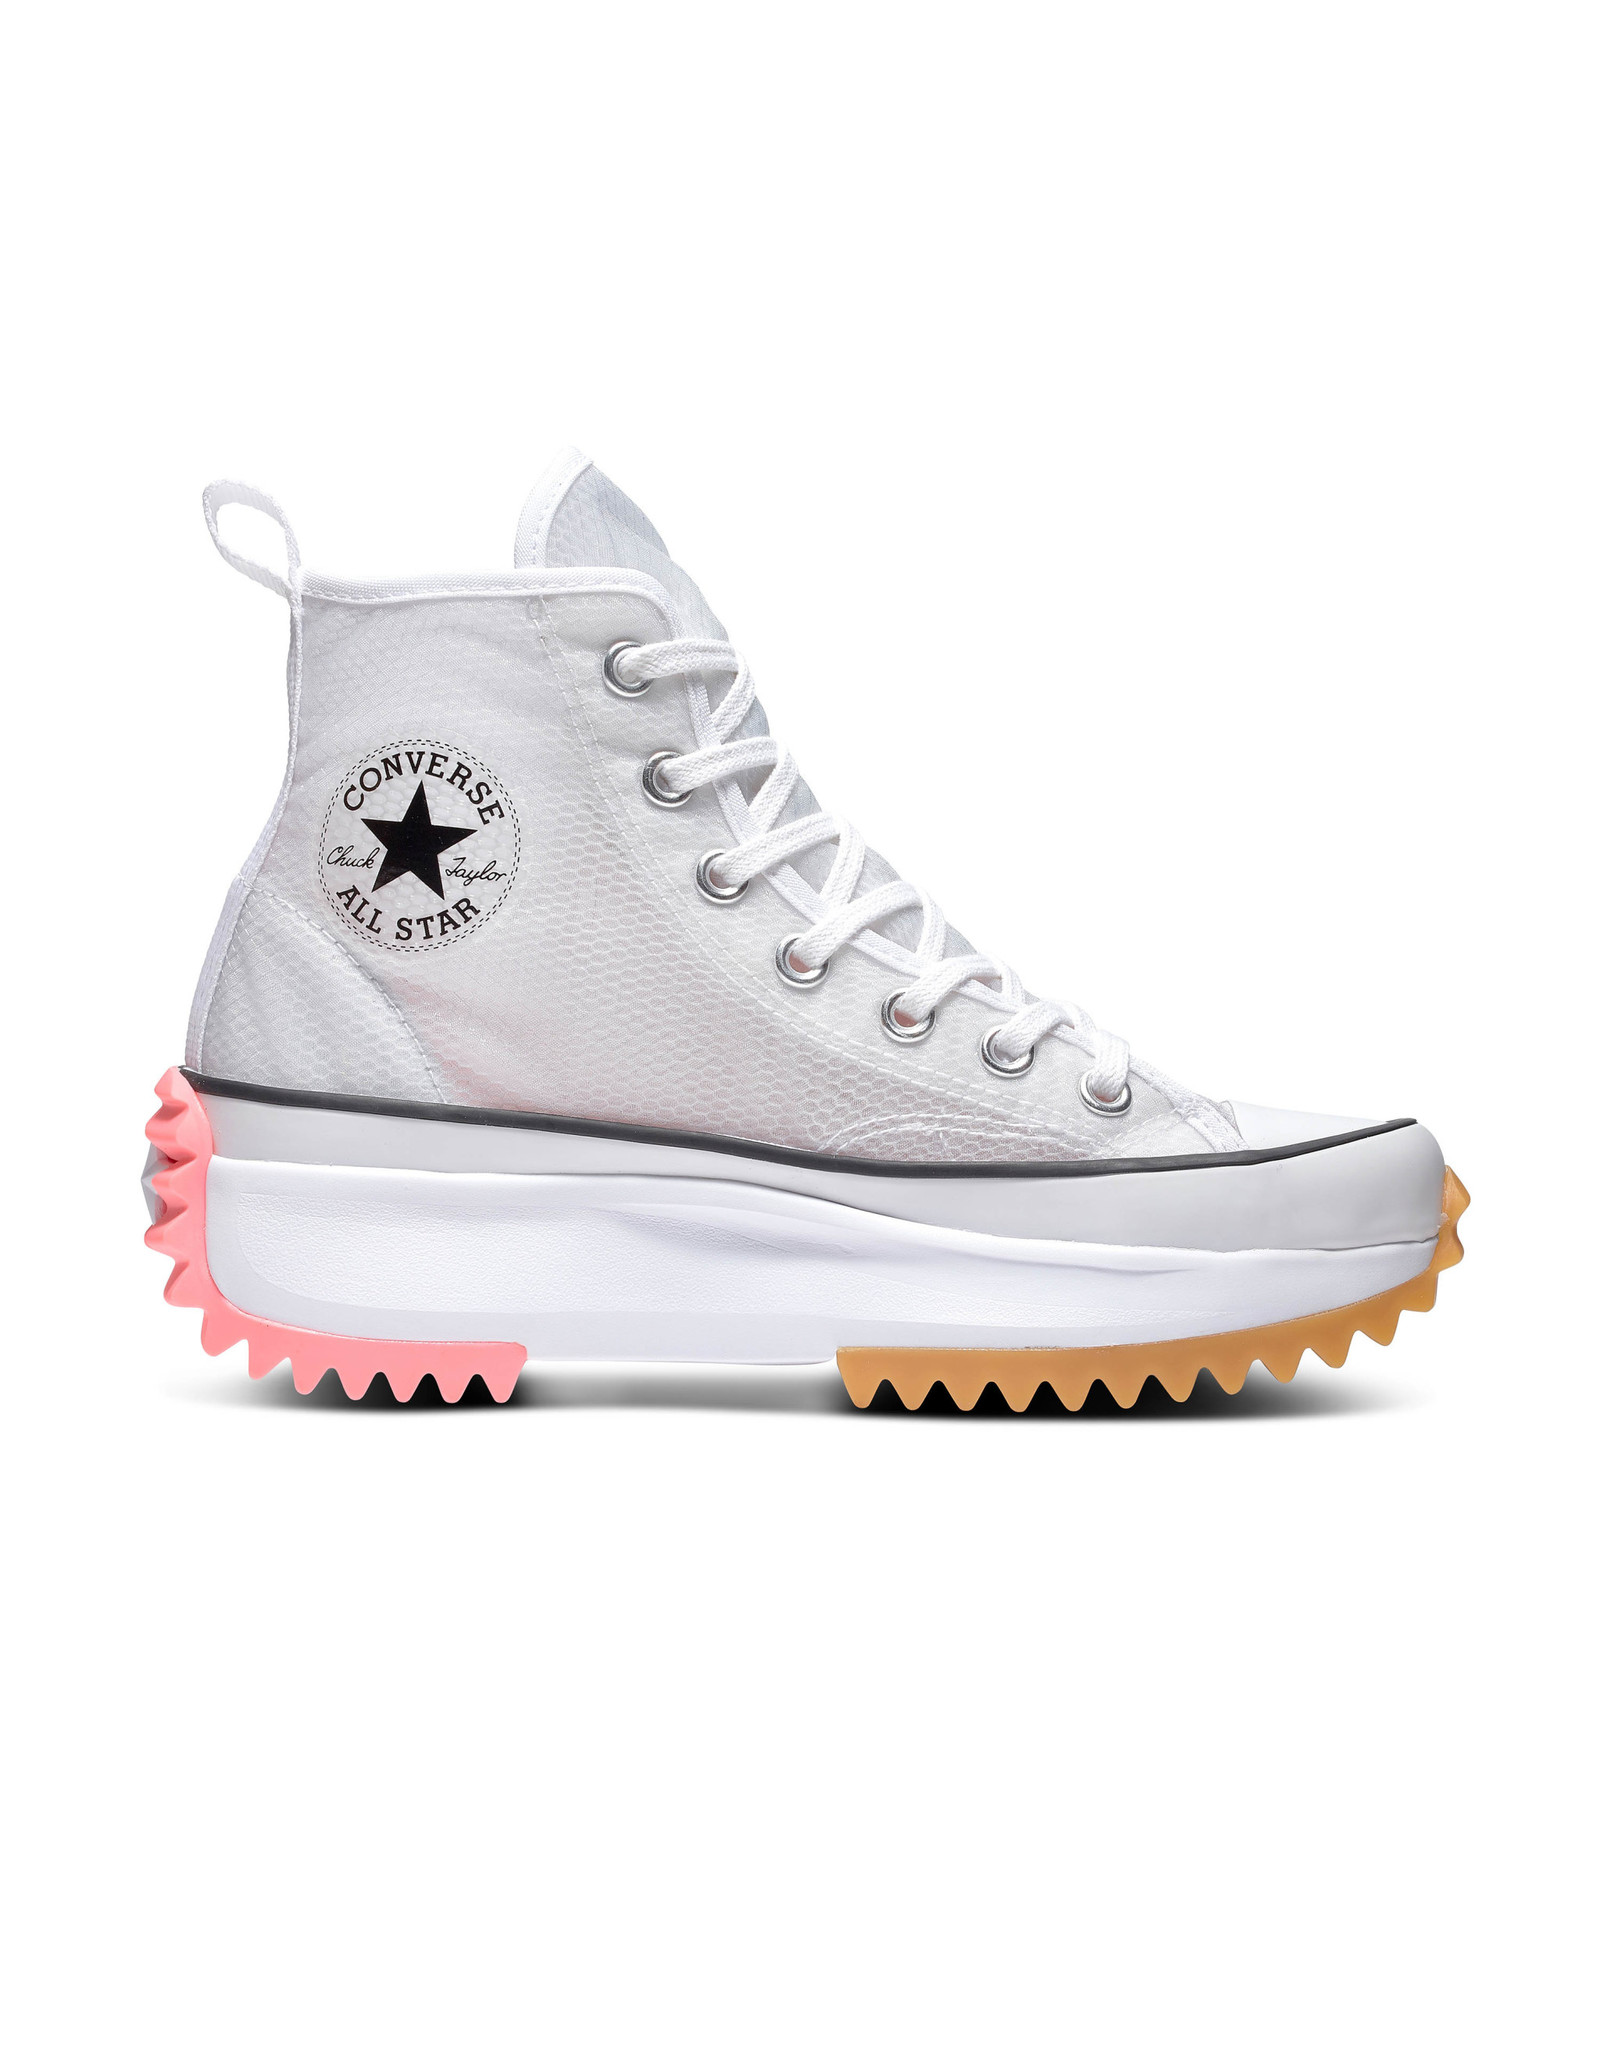 CONVERSE RUN STAR HIKE HI WHITE/BLACK C070PW-167851C